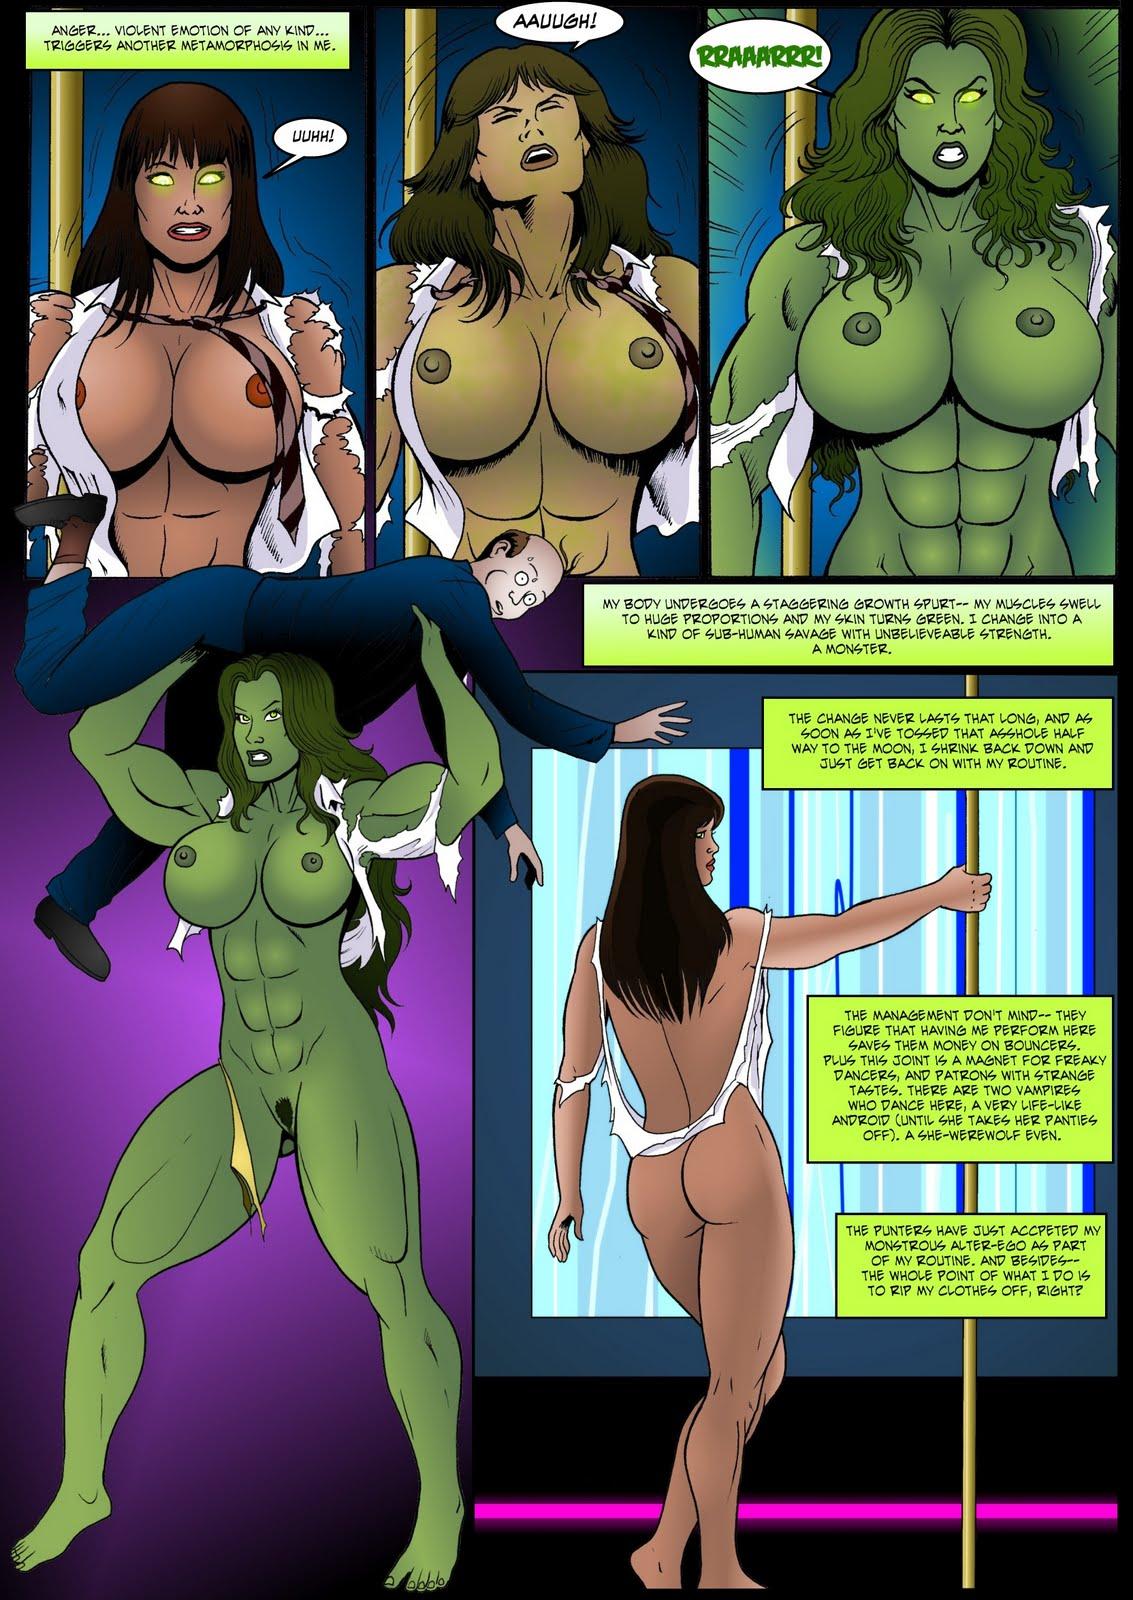 hot tub nude scenes